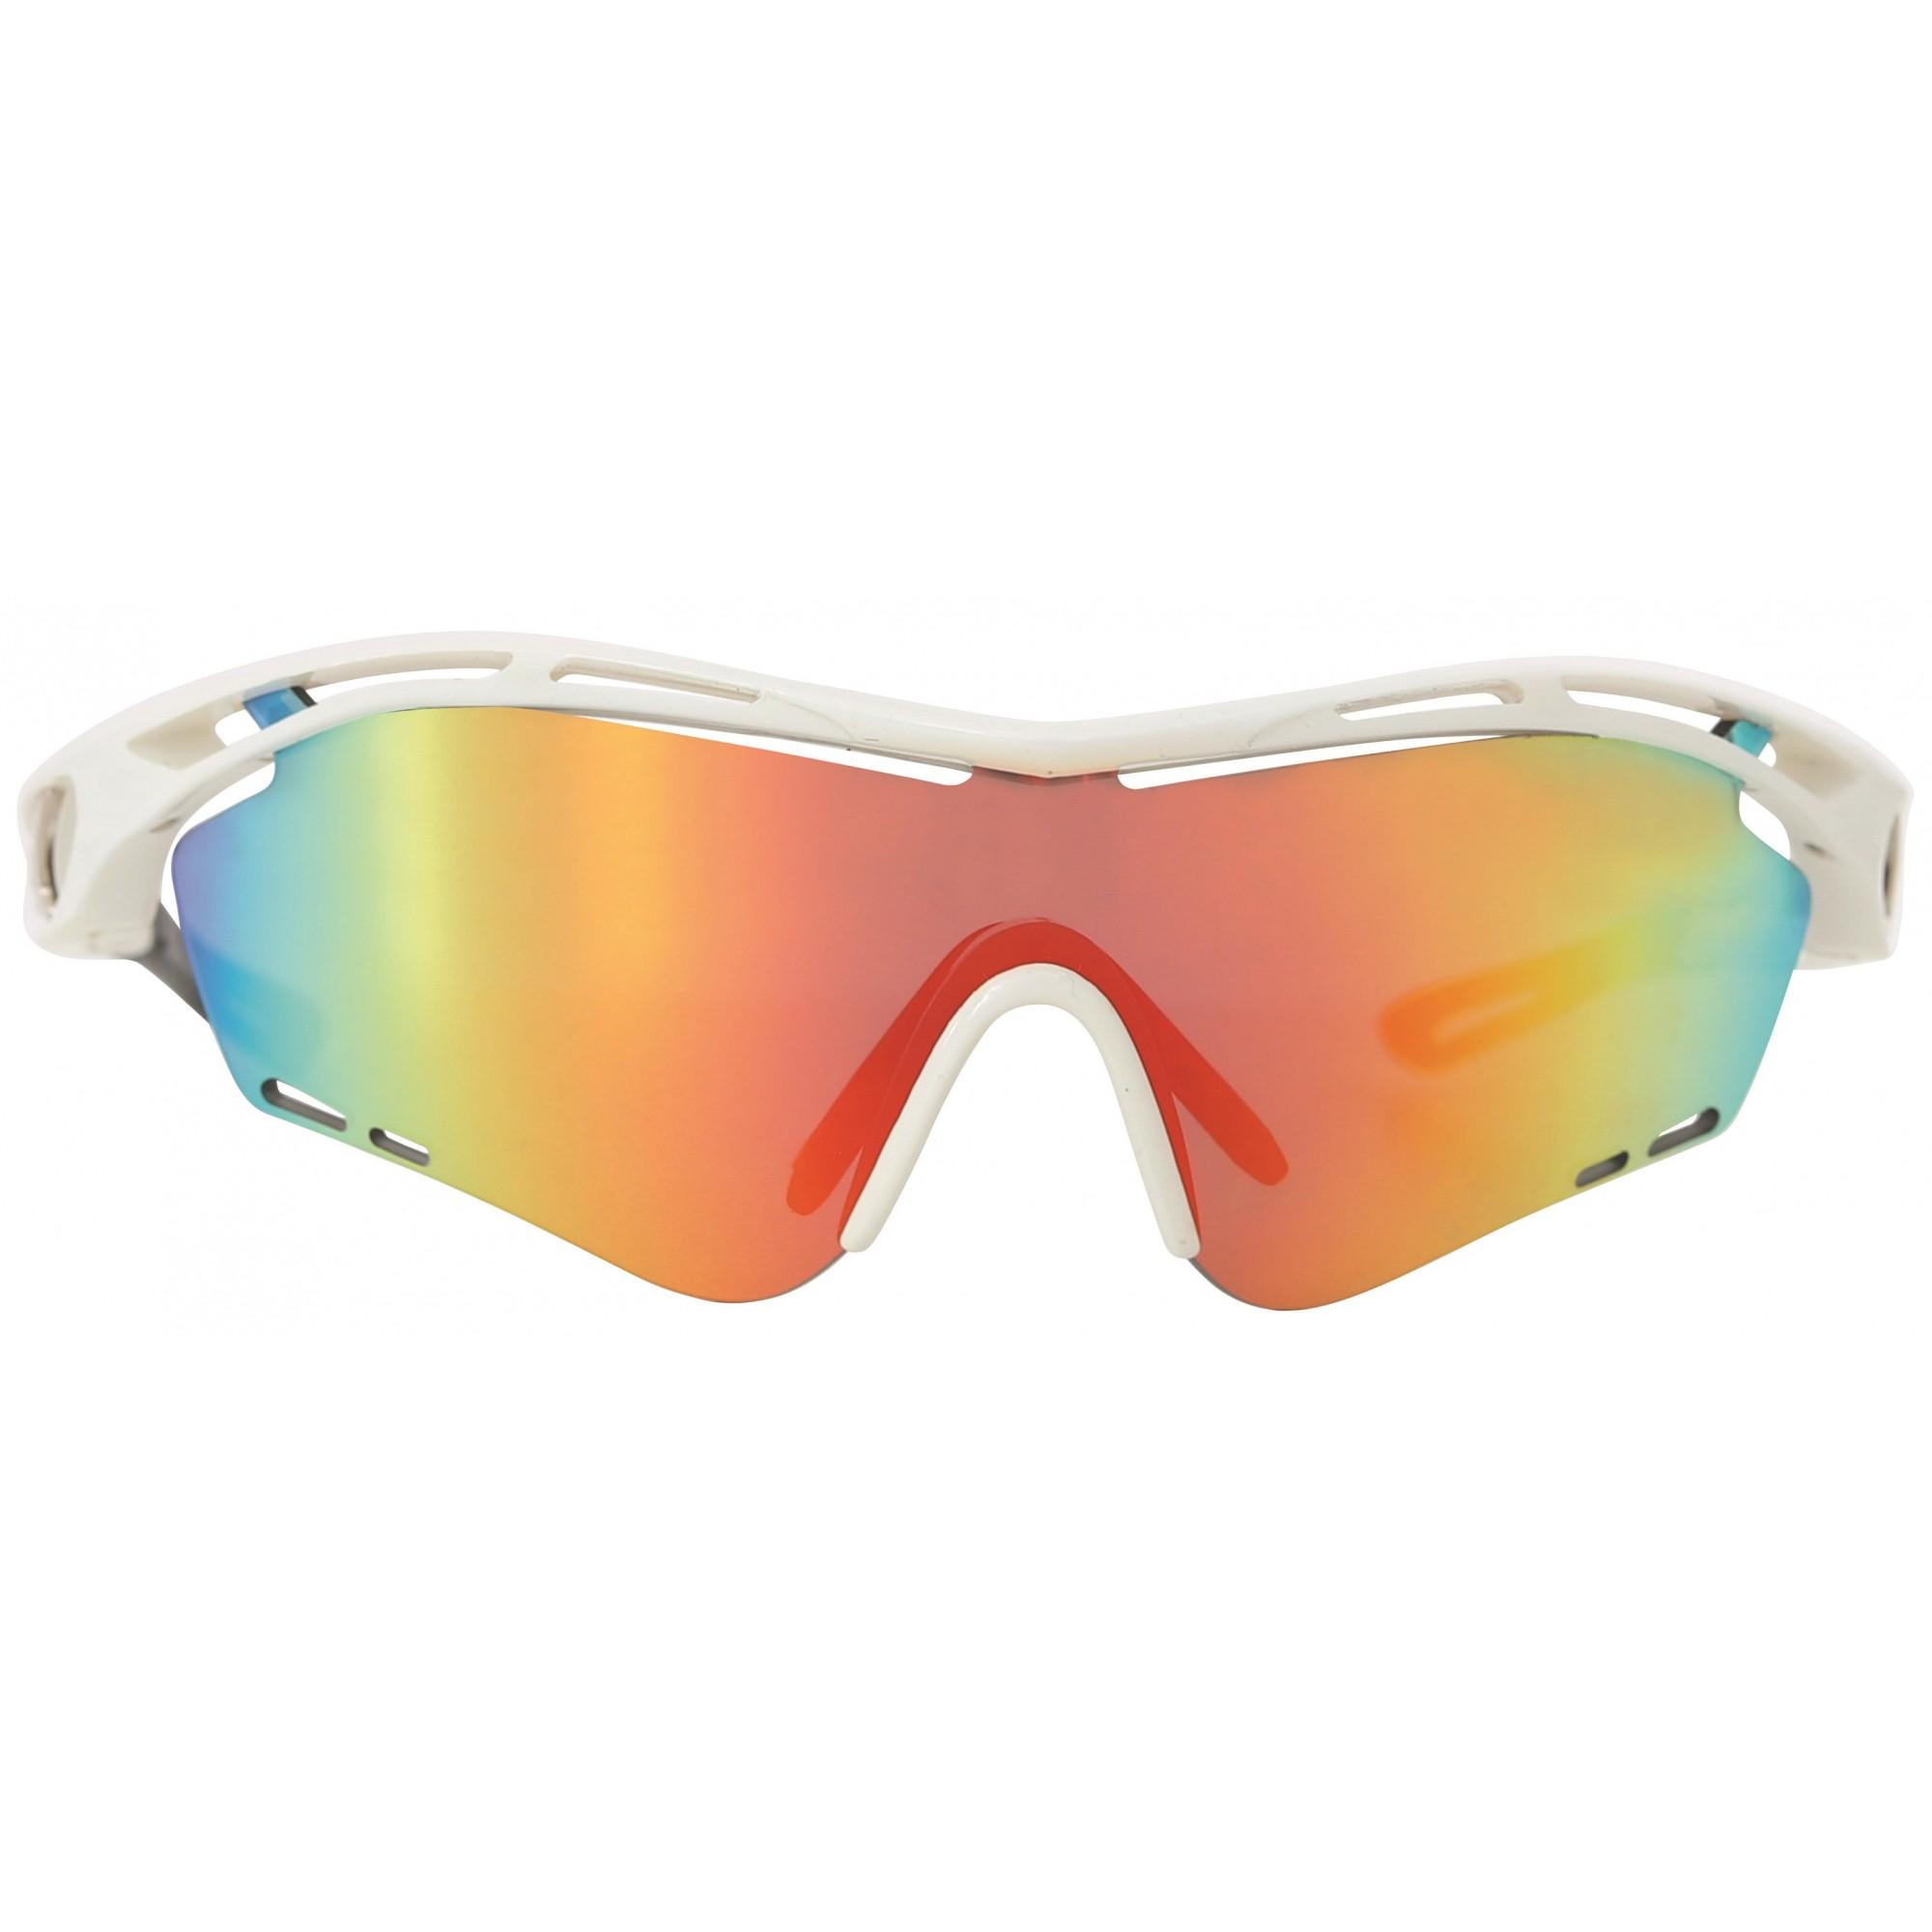 Óculos VTECH DX3 Branco